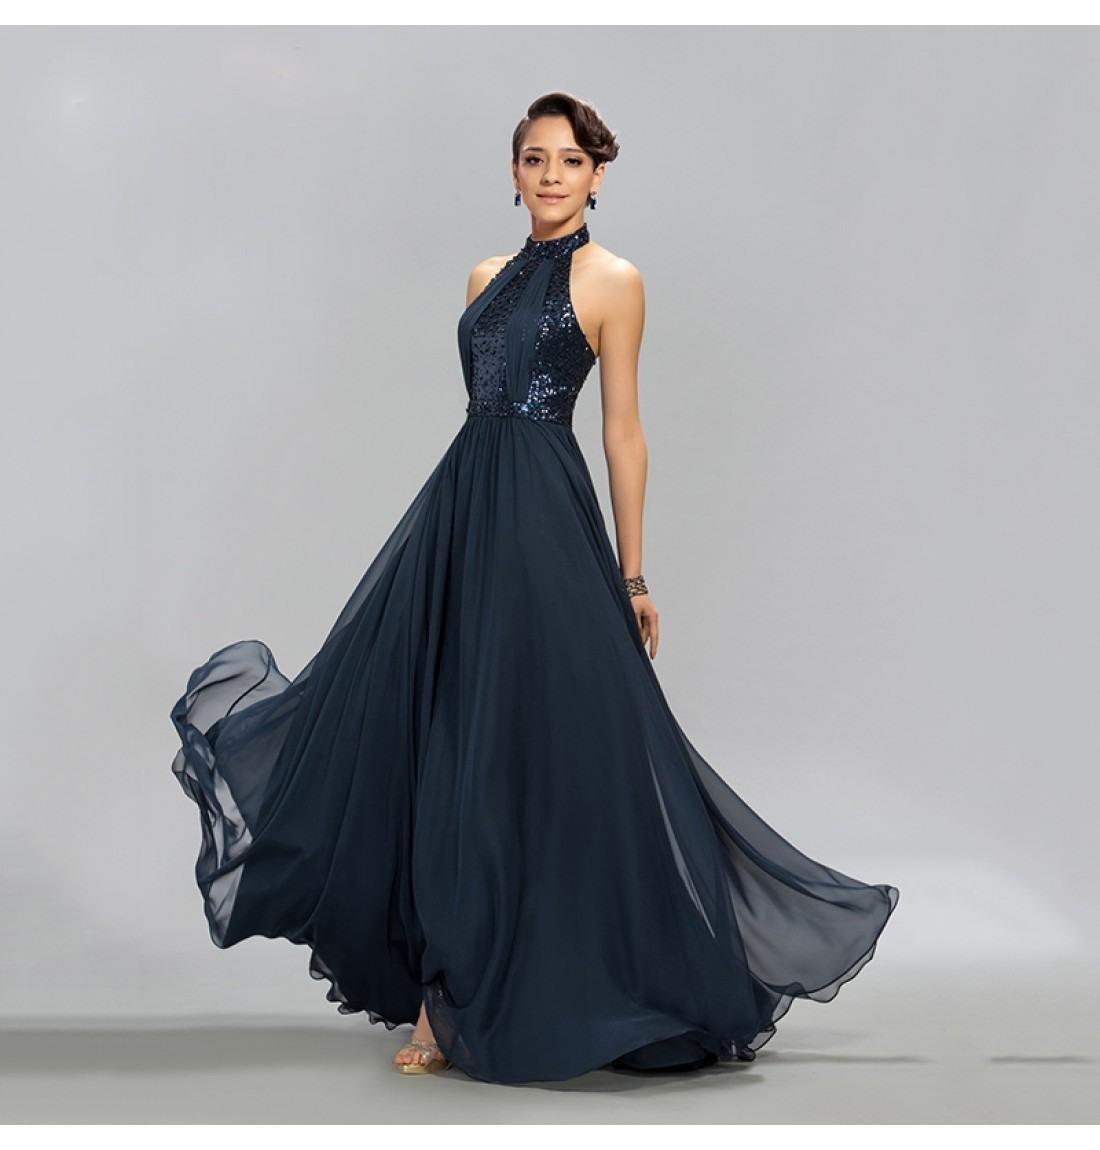 20 Cool Abendkleider Lang DesignAbend Top Abendkleider Lang Ärmel